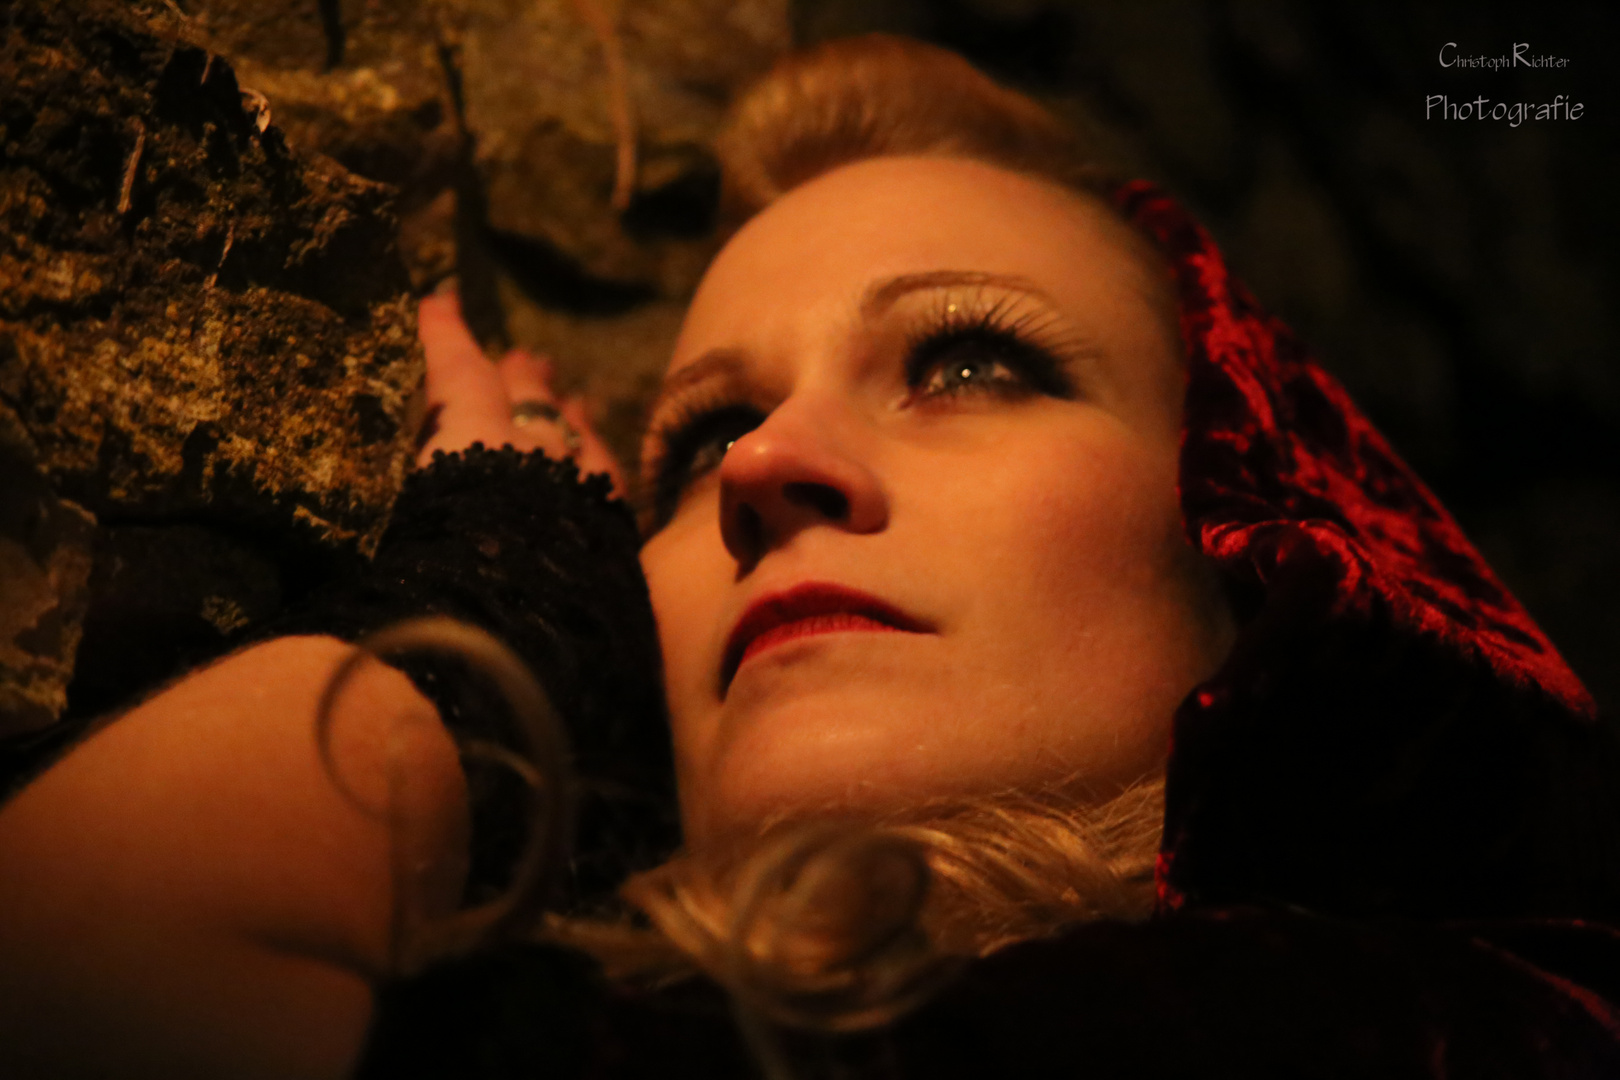 Burgfräulein-Shooting: Princess and her dream